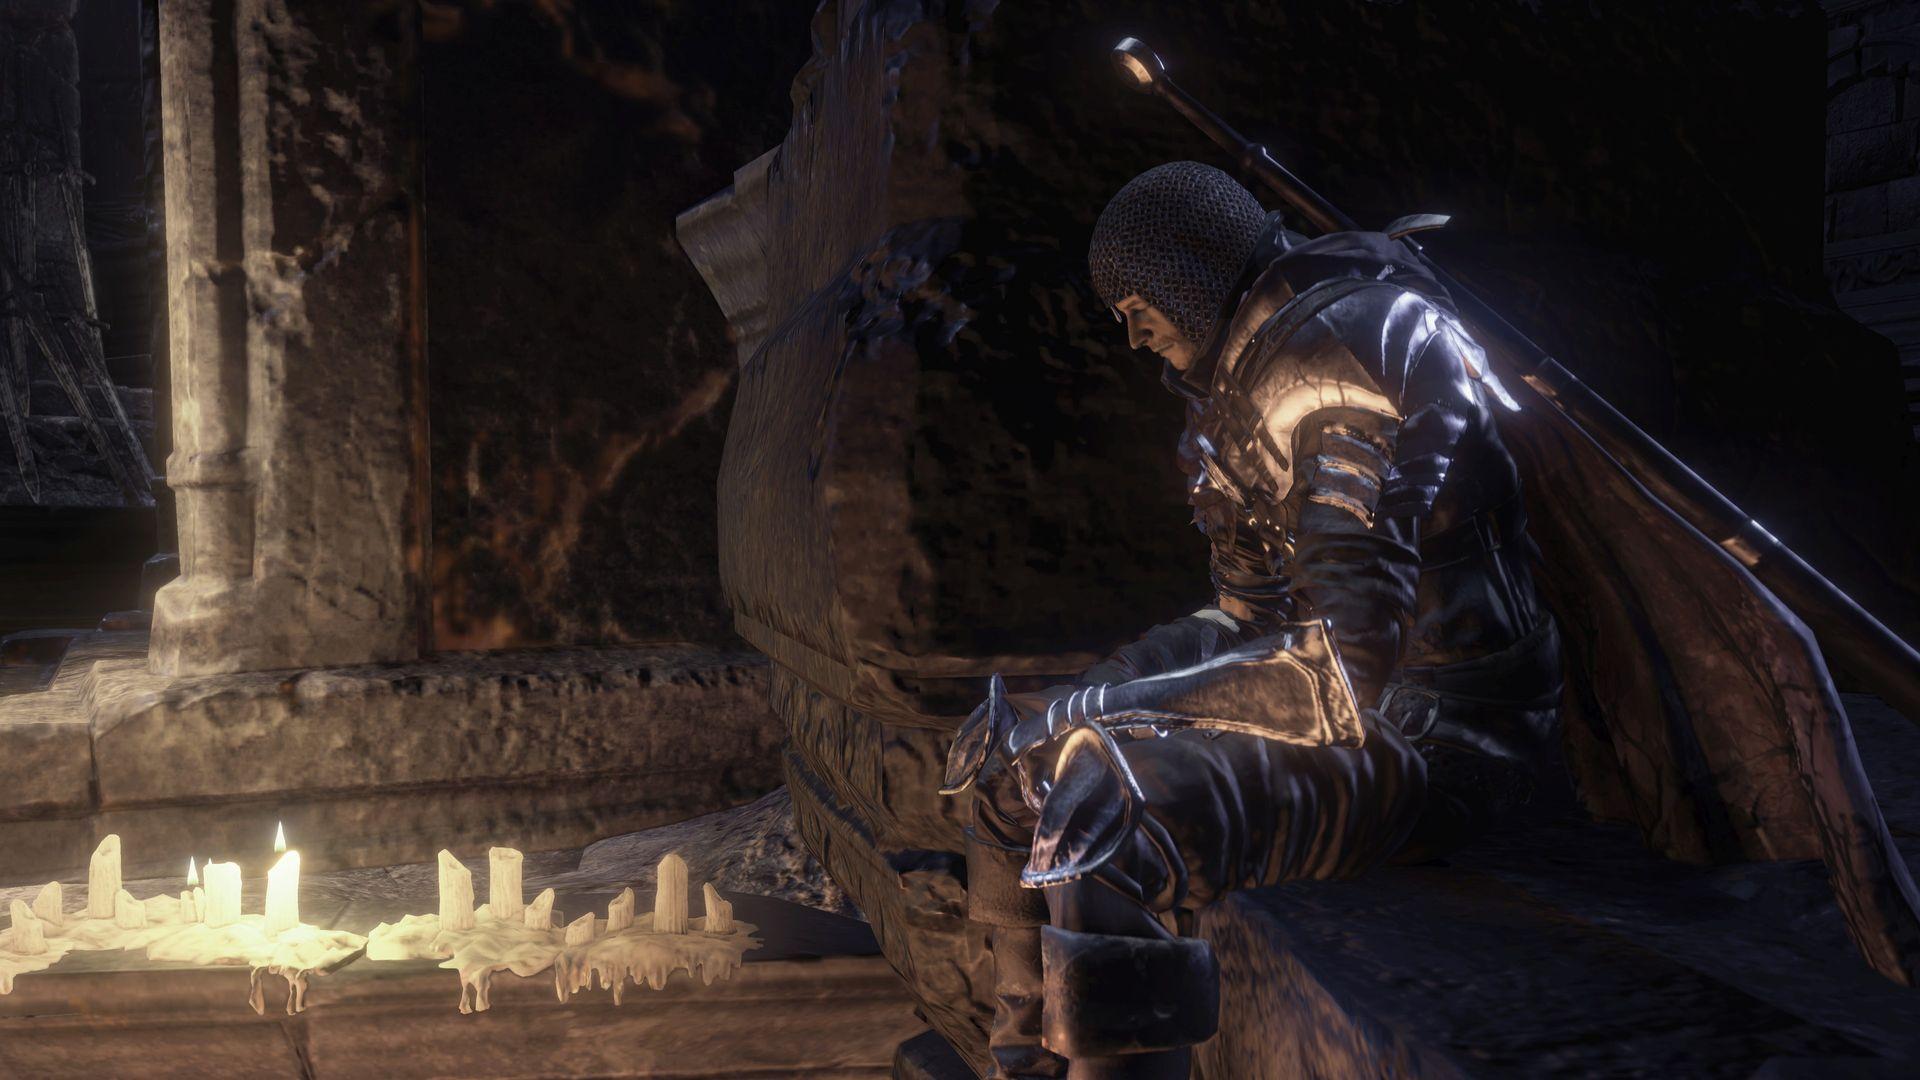 matchmaking en ligne Dark Souls 2 wikidot rencontres en ligne Karlsruhe